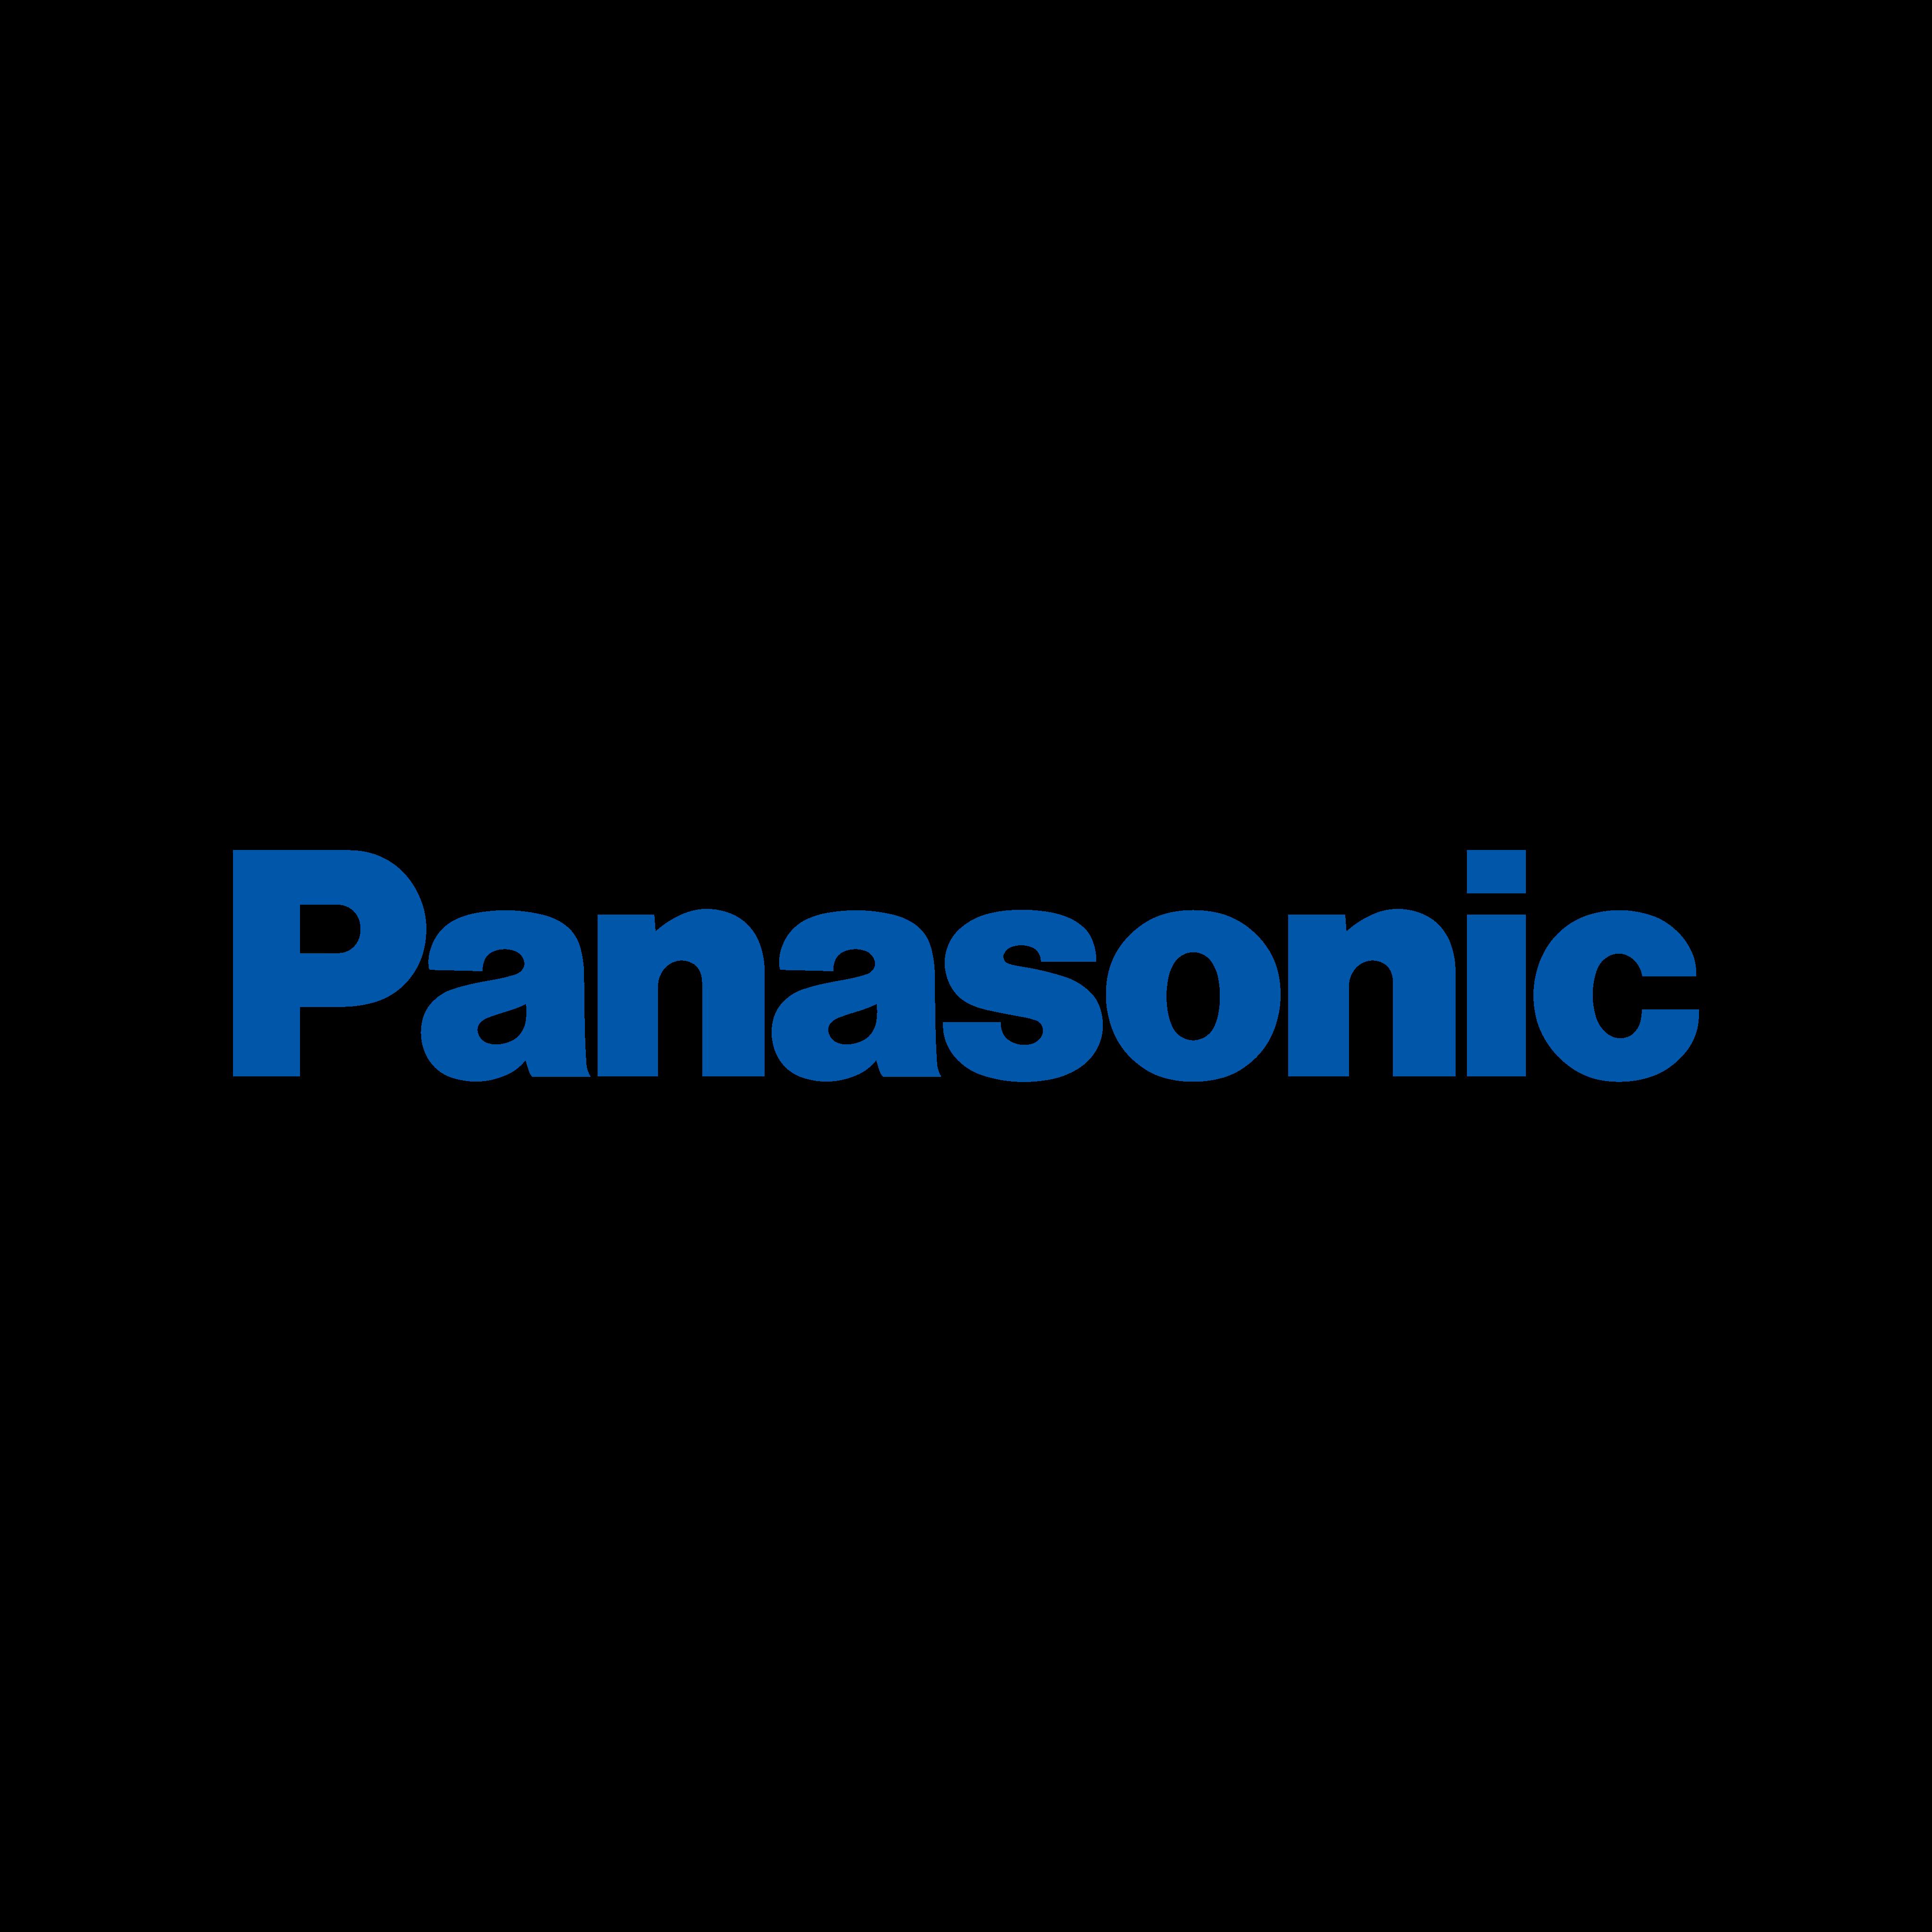 panasonic logo 0 - Panasonic Logo